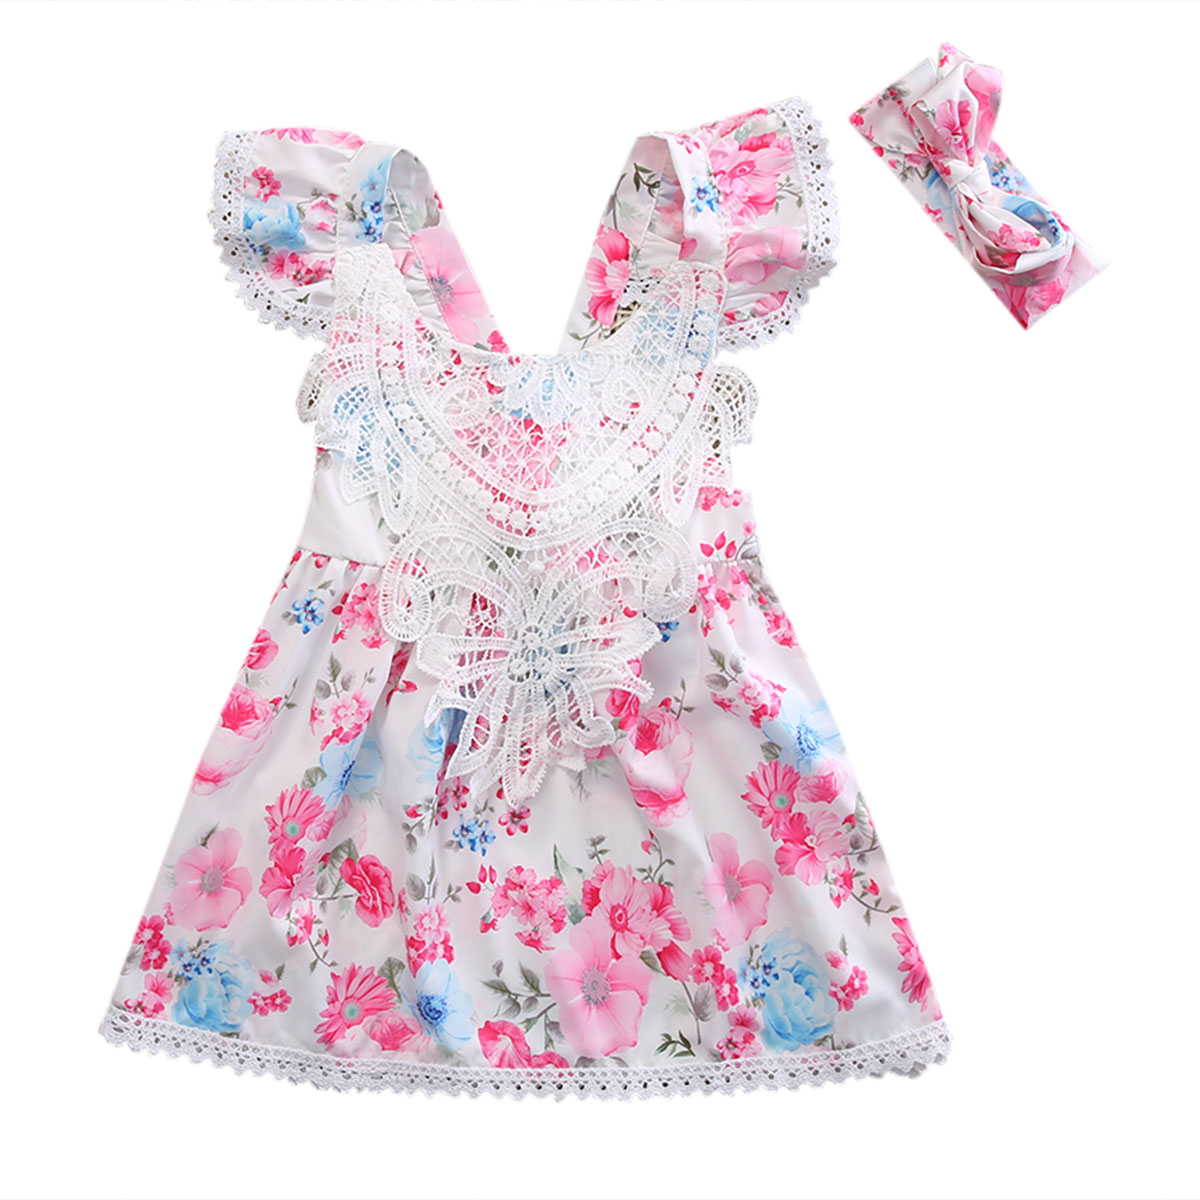 bba4109865f8 New Arrival Newborn Toddler Kids Baby Girl Flower Floral Dress ...